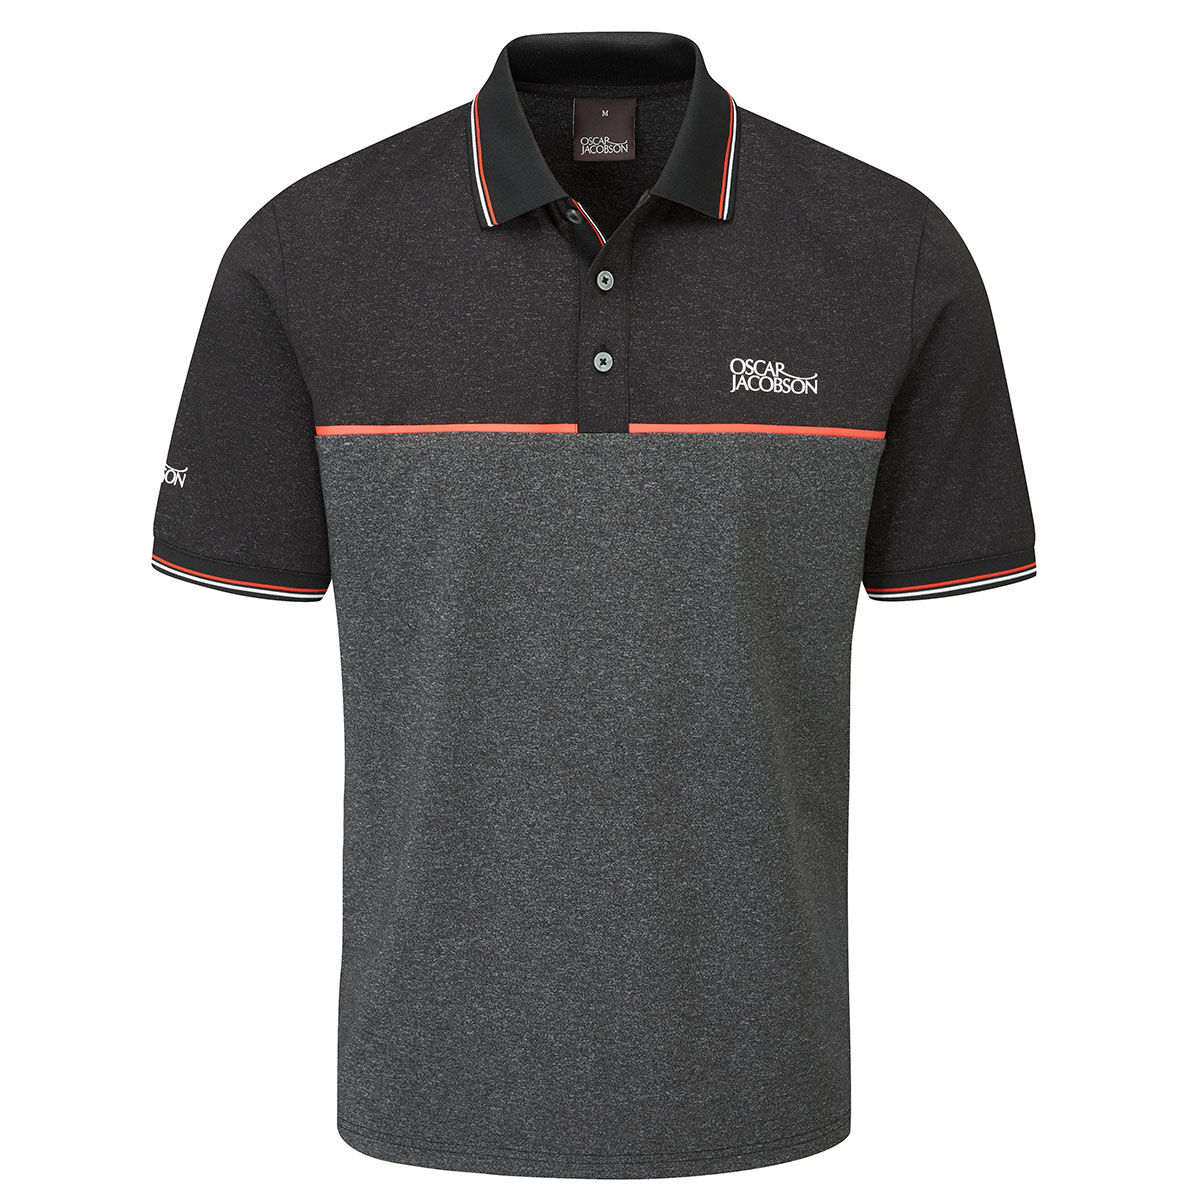 Oscar Jacobson Belford Golf Polo Shirt, Mens, Small, Black marl | American Golf